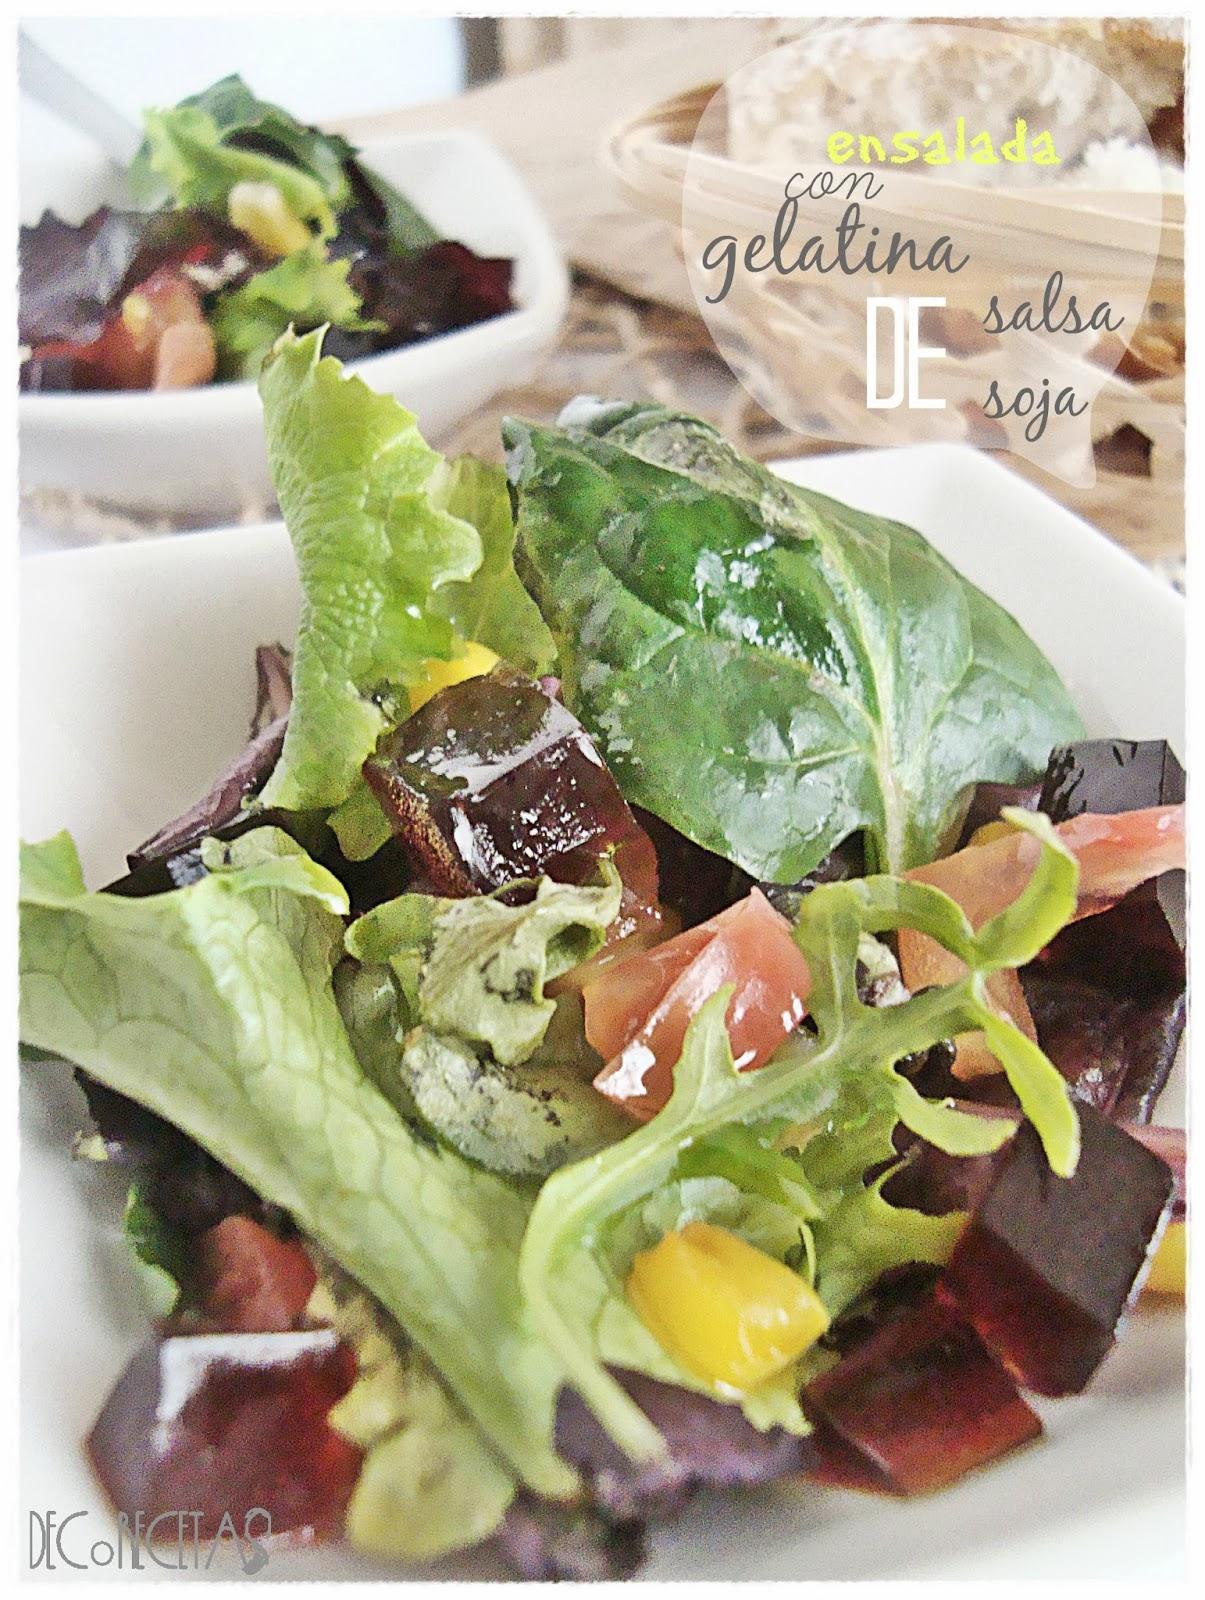 Ensalada con gelatina de salsa de soja